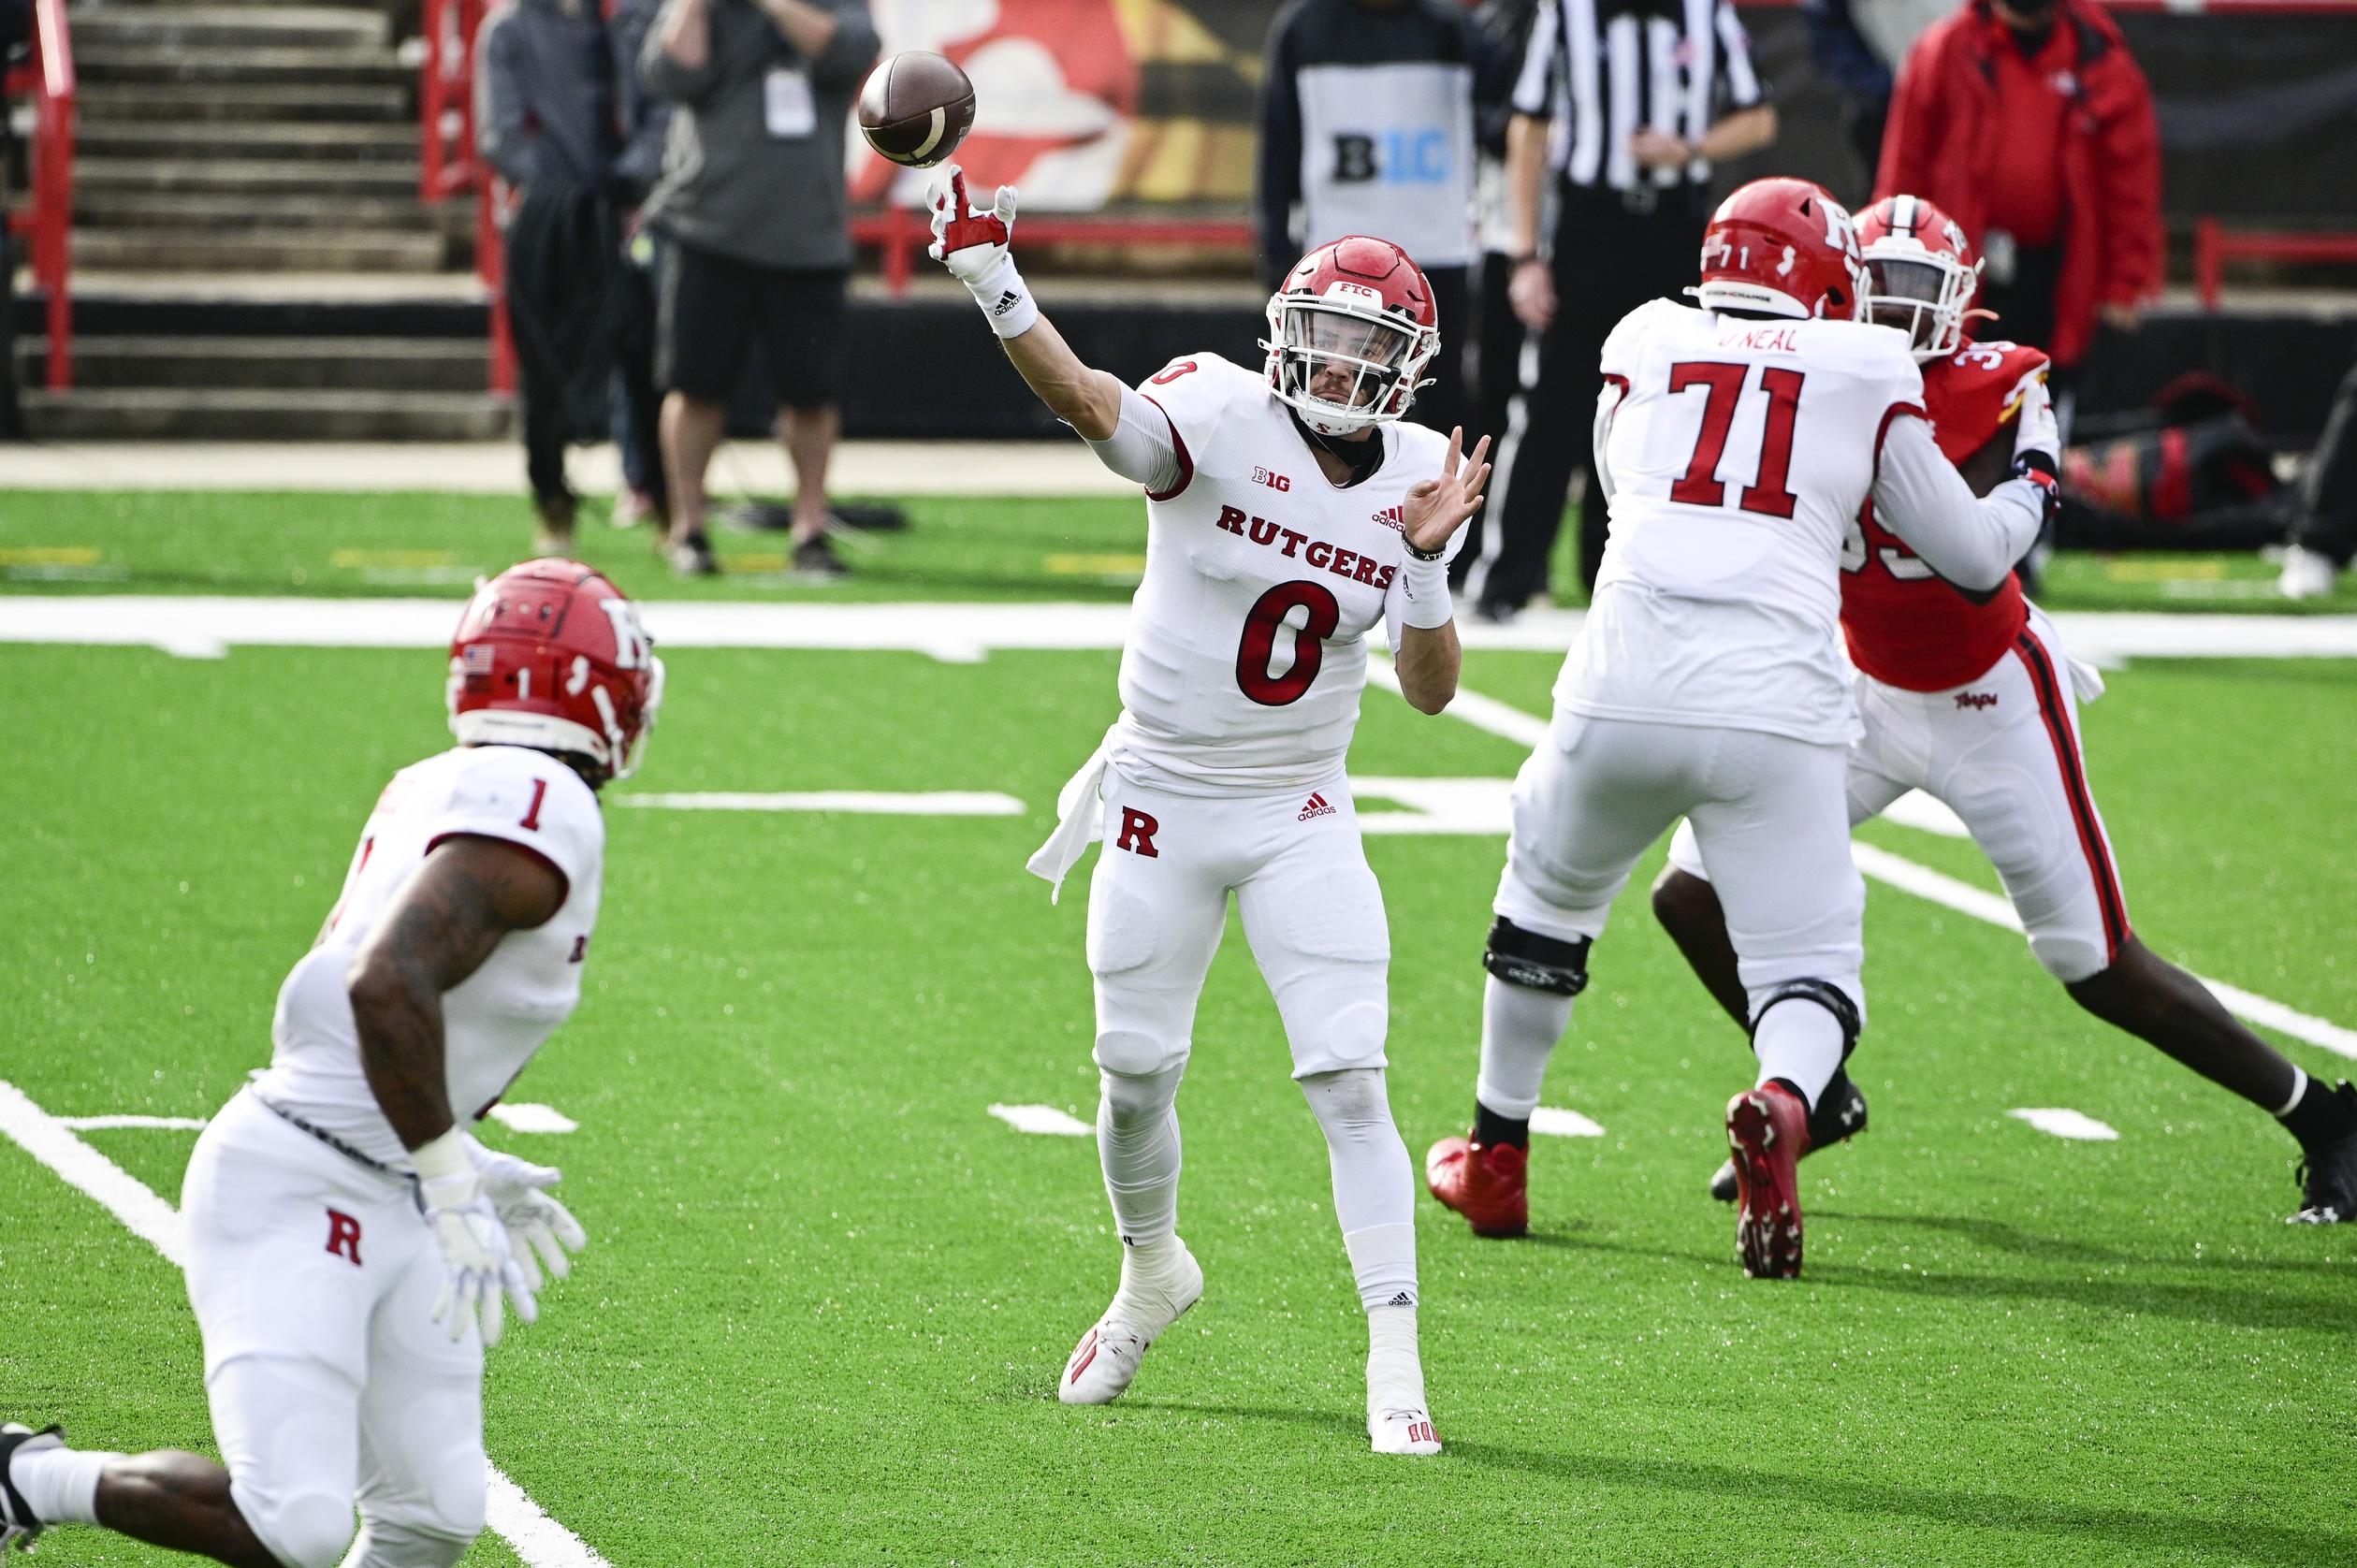 College football picks Noah Vedral Rutgers Scarlet Knights season predictions